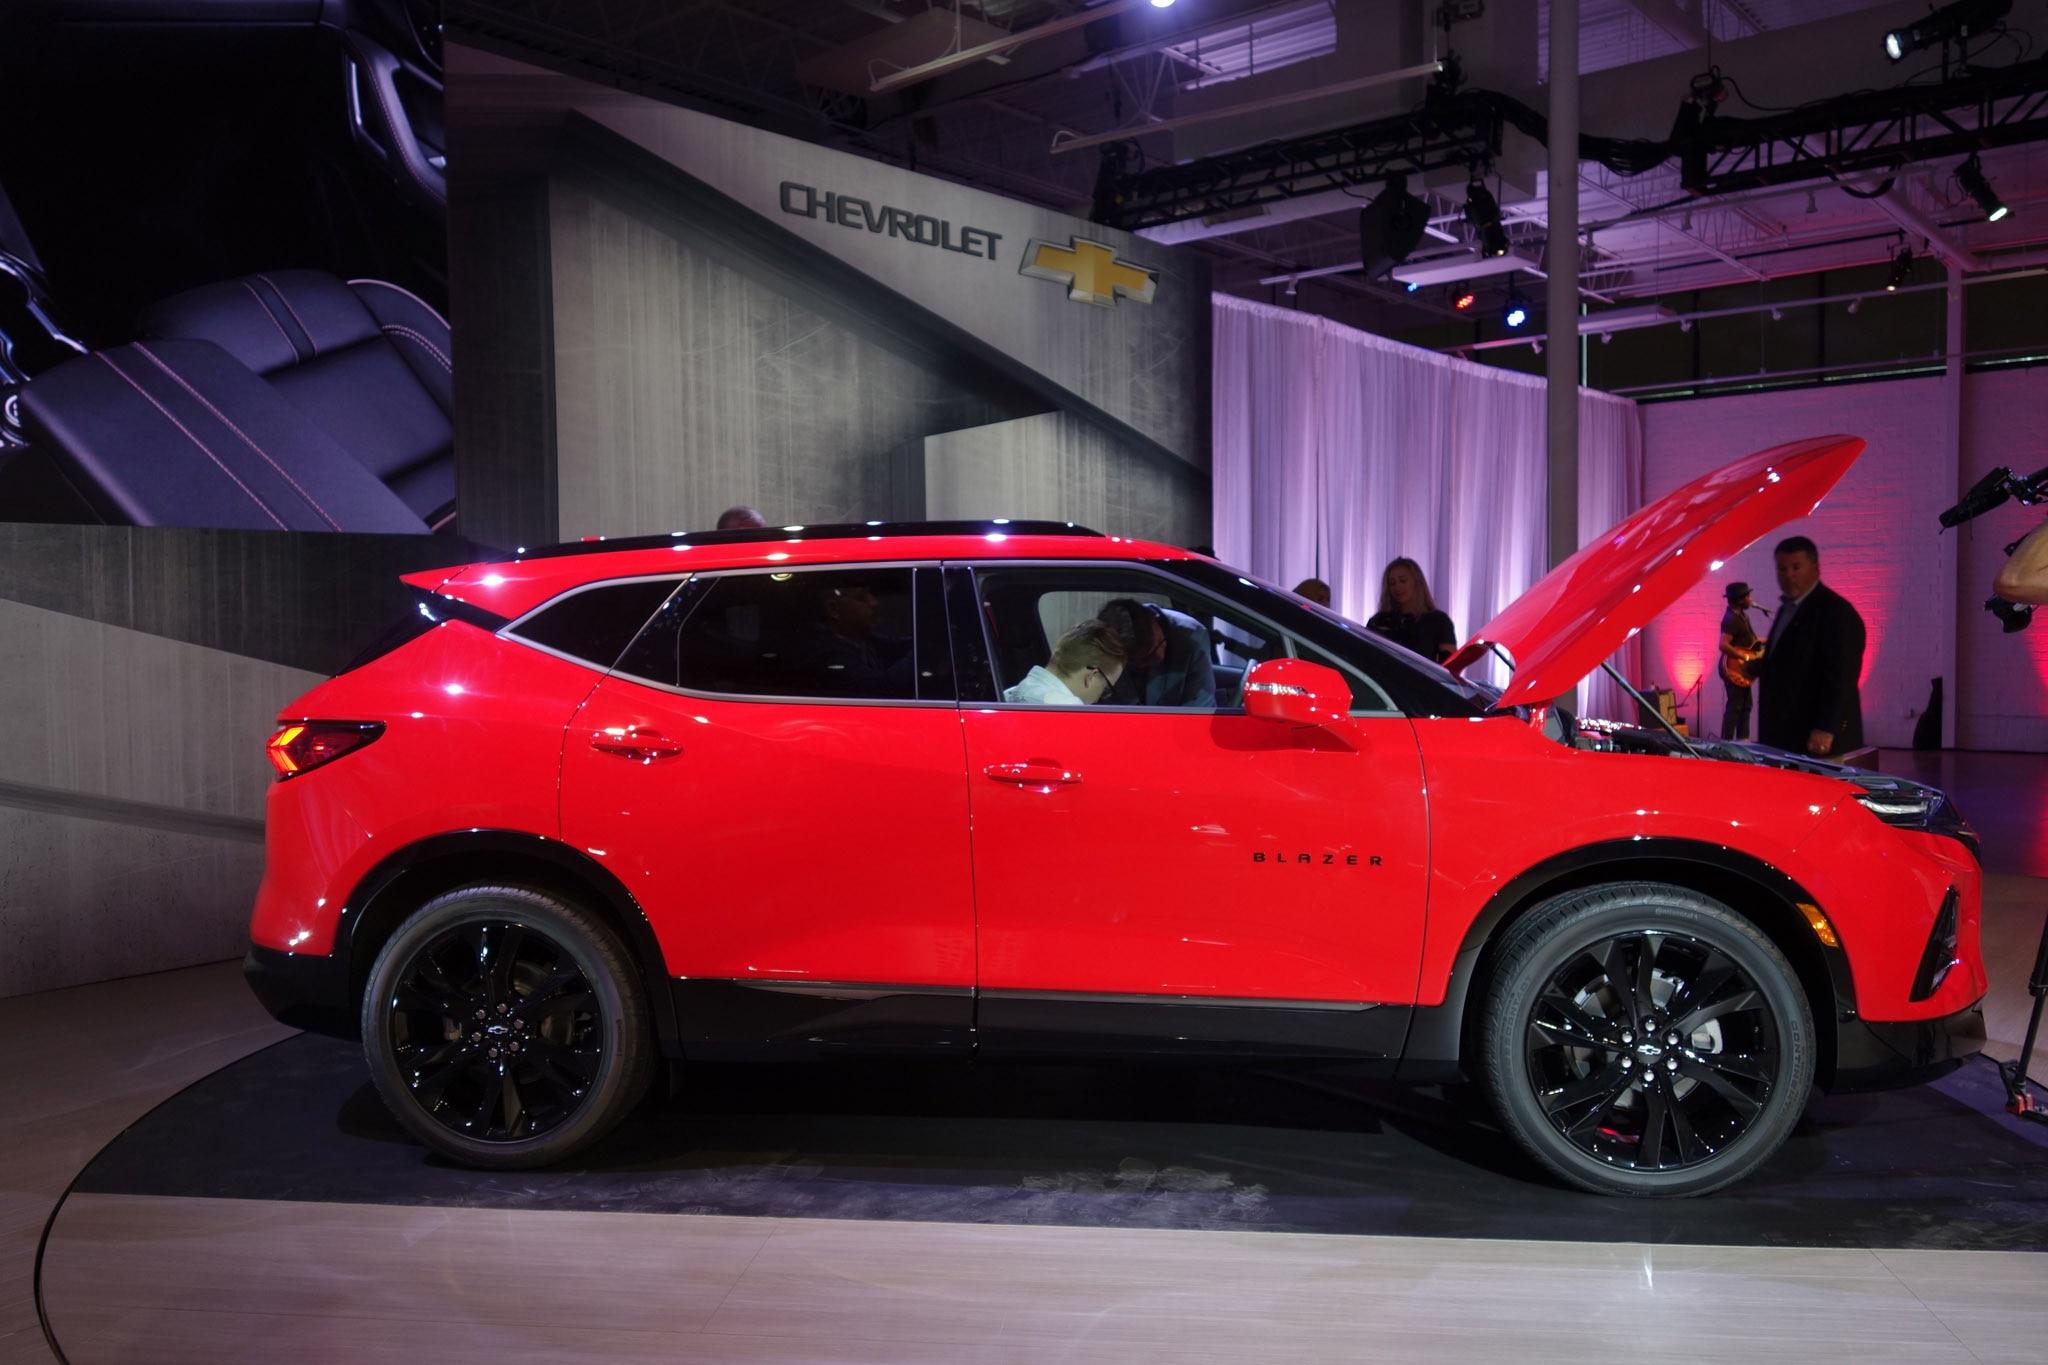 The Big 2019 Chevrolet Blazer Photo Gallery | Automobile ...